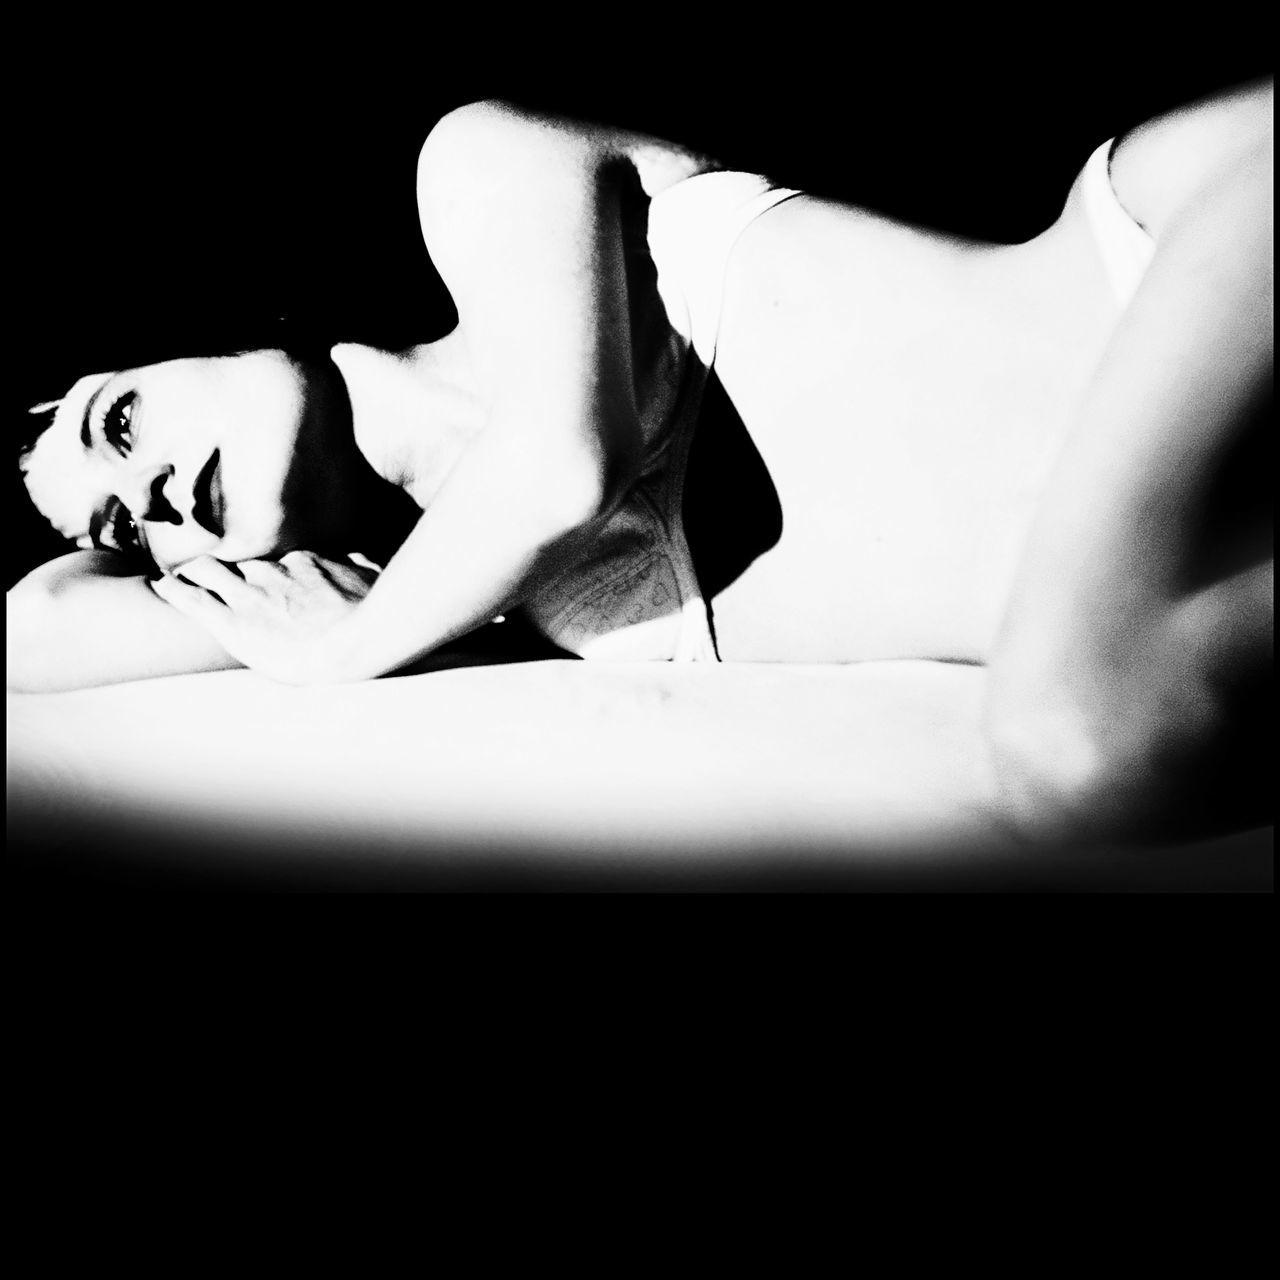 Allone  Allonetime Bed Bedroom Black Background Close-up Dark Part Of Sadness Vignette White